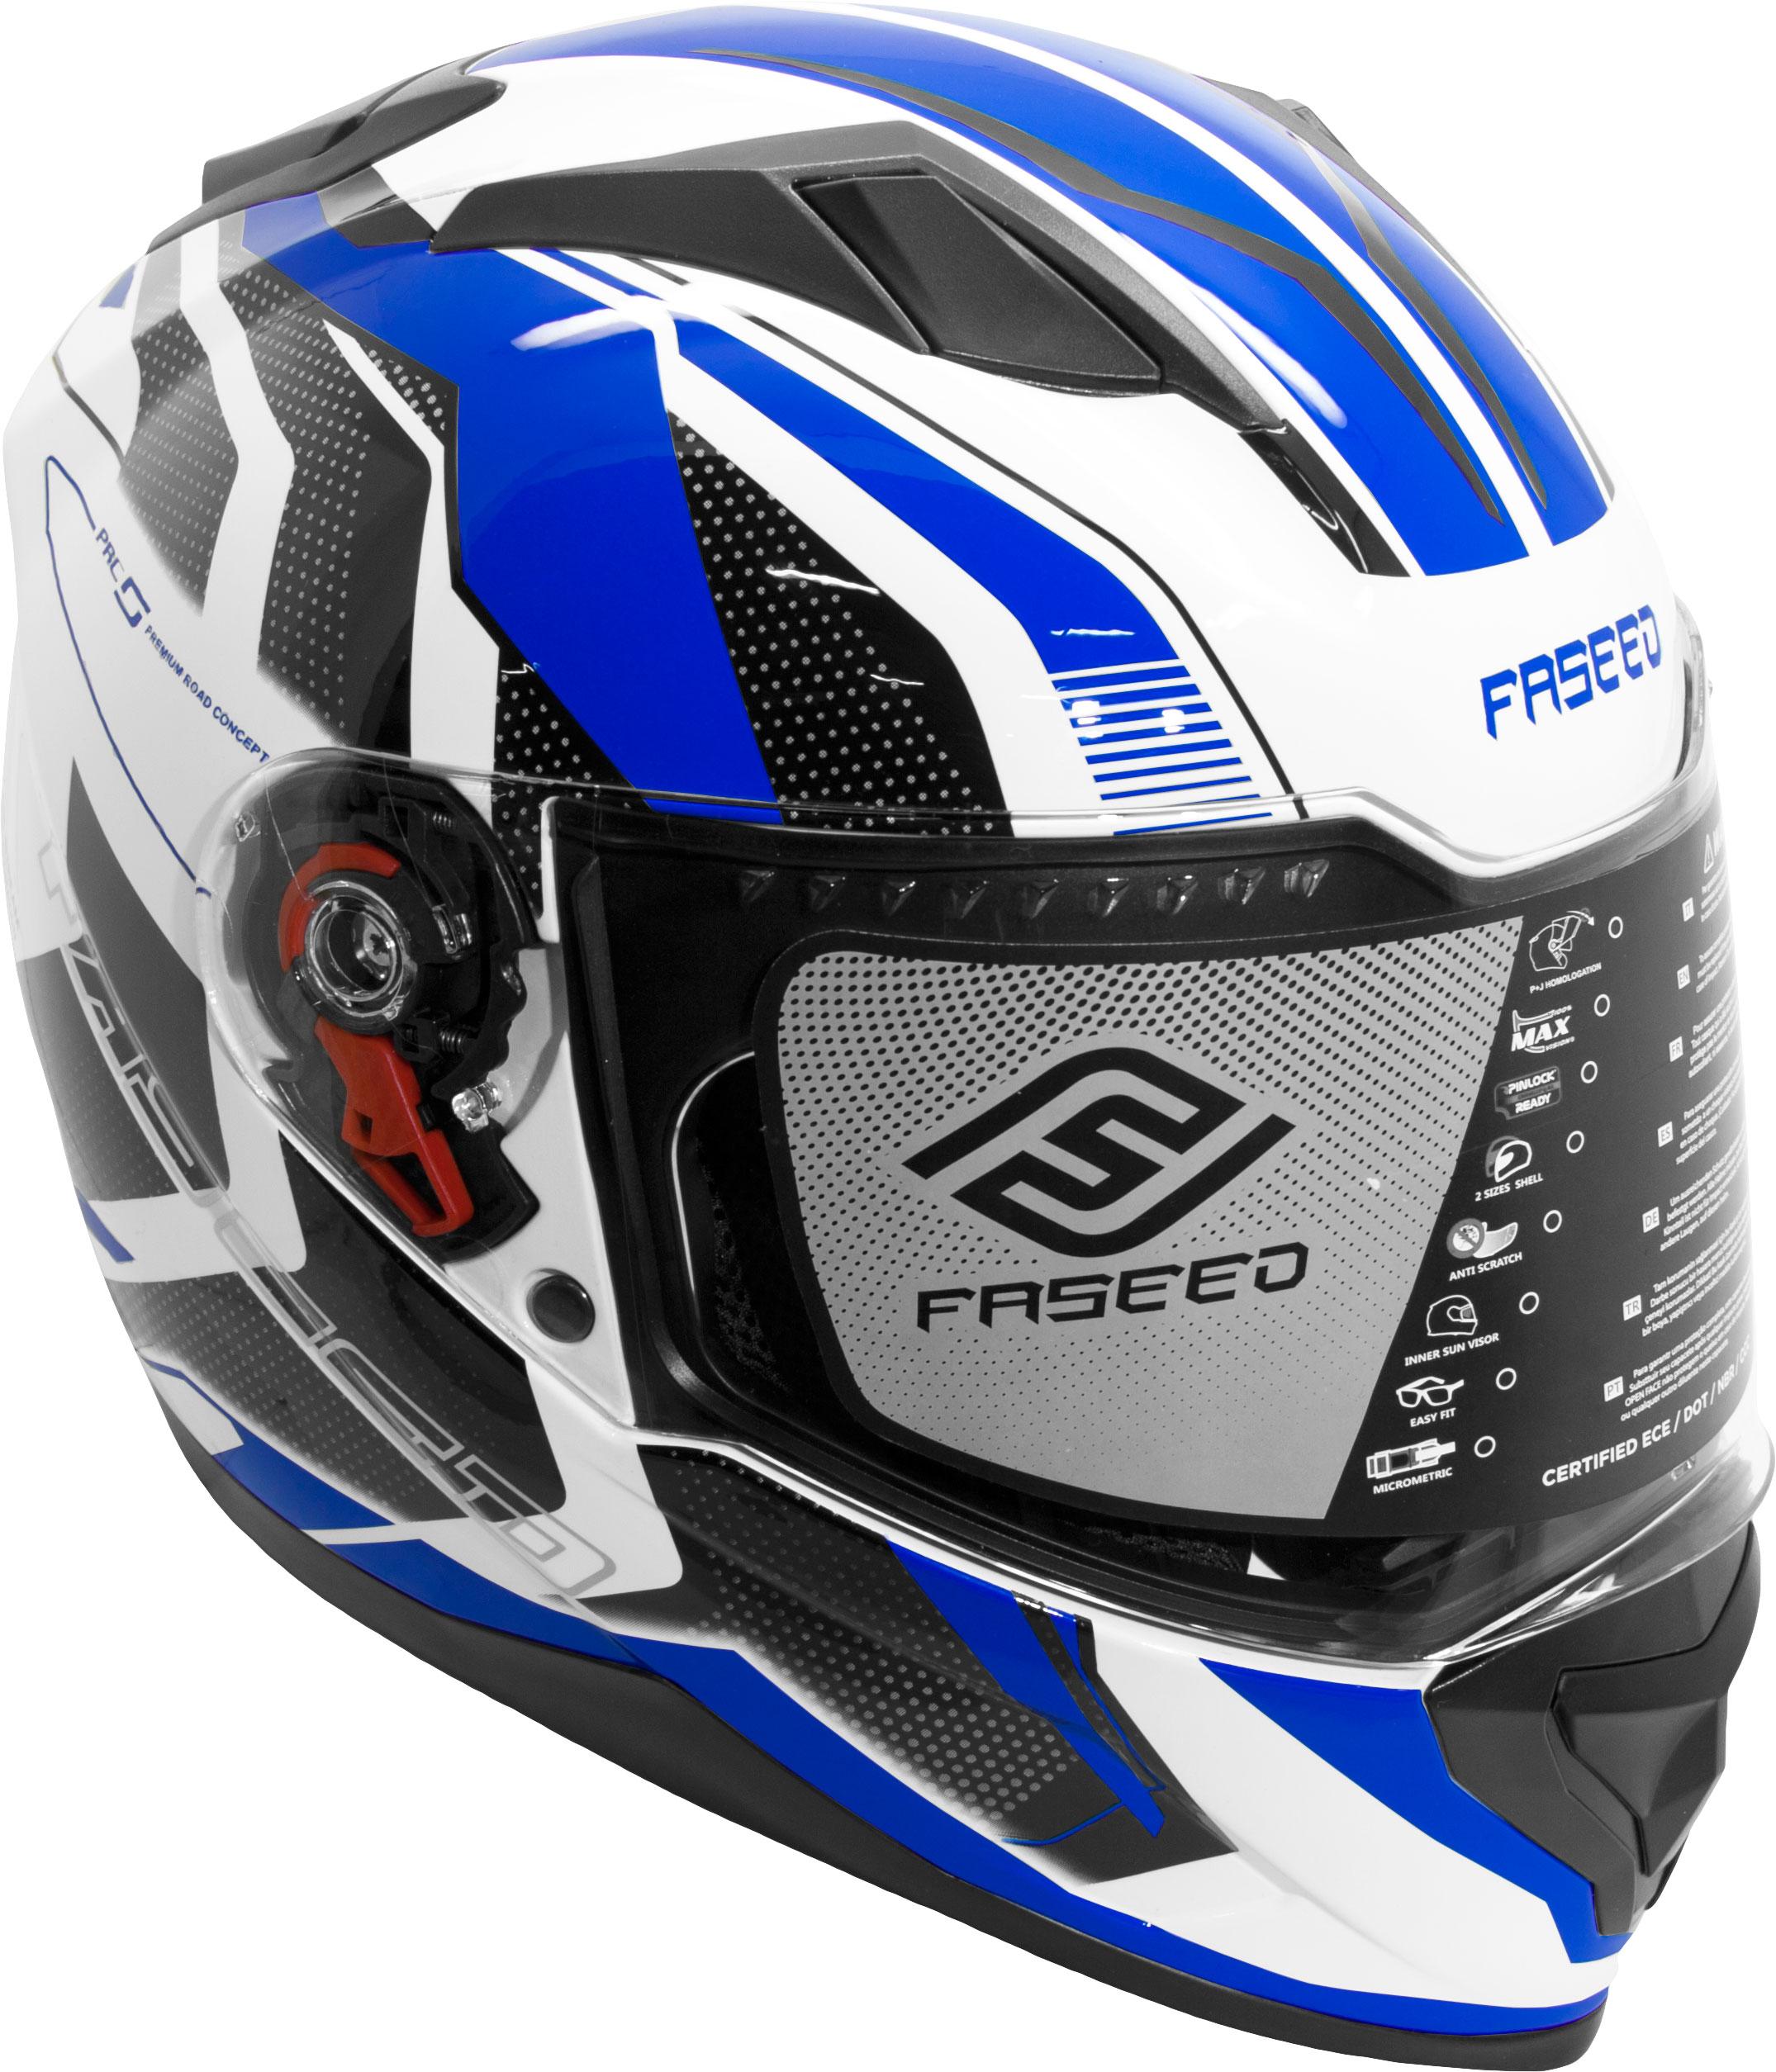 Faseed FS 819 Helmet Blue Image